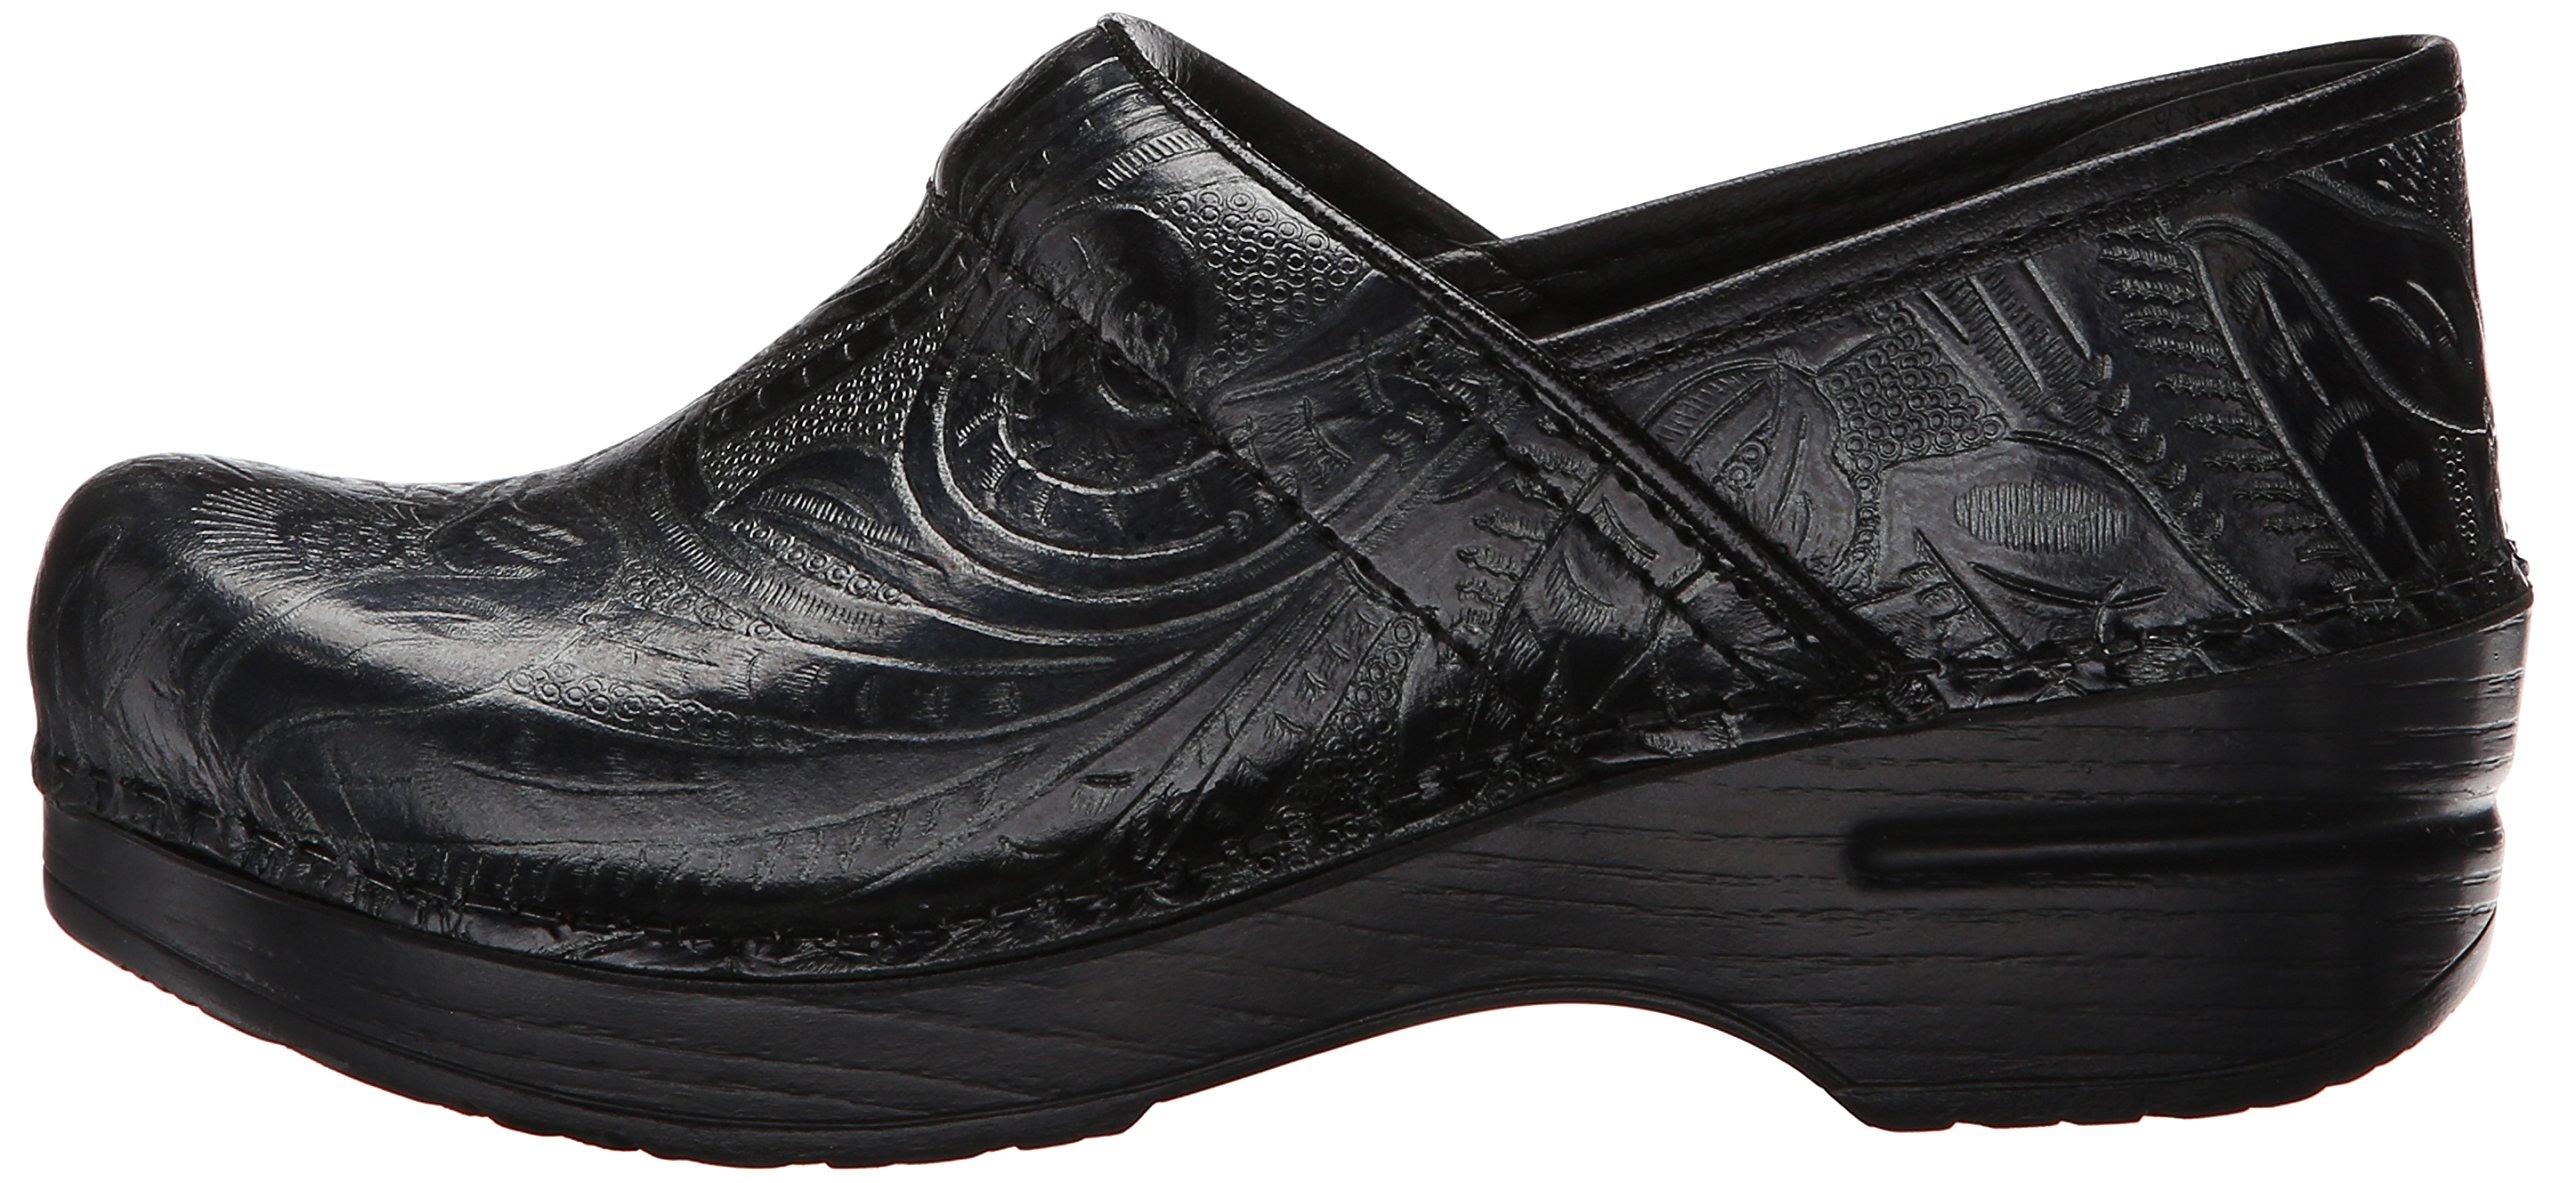 Dansko Women's Professional Clog, Black Tooled Leather , 35 EU/4.5-5 M US by Dansko (Image #5)